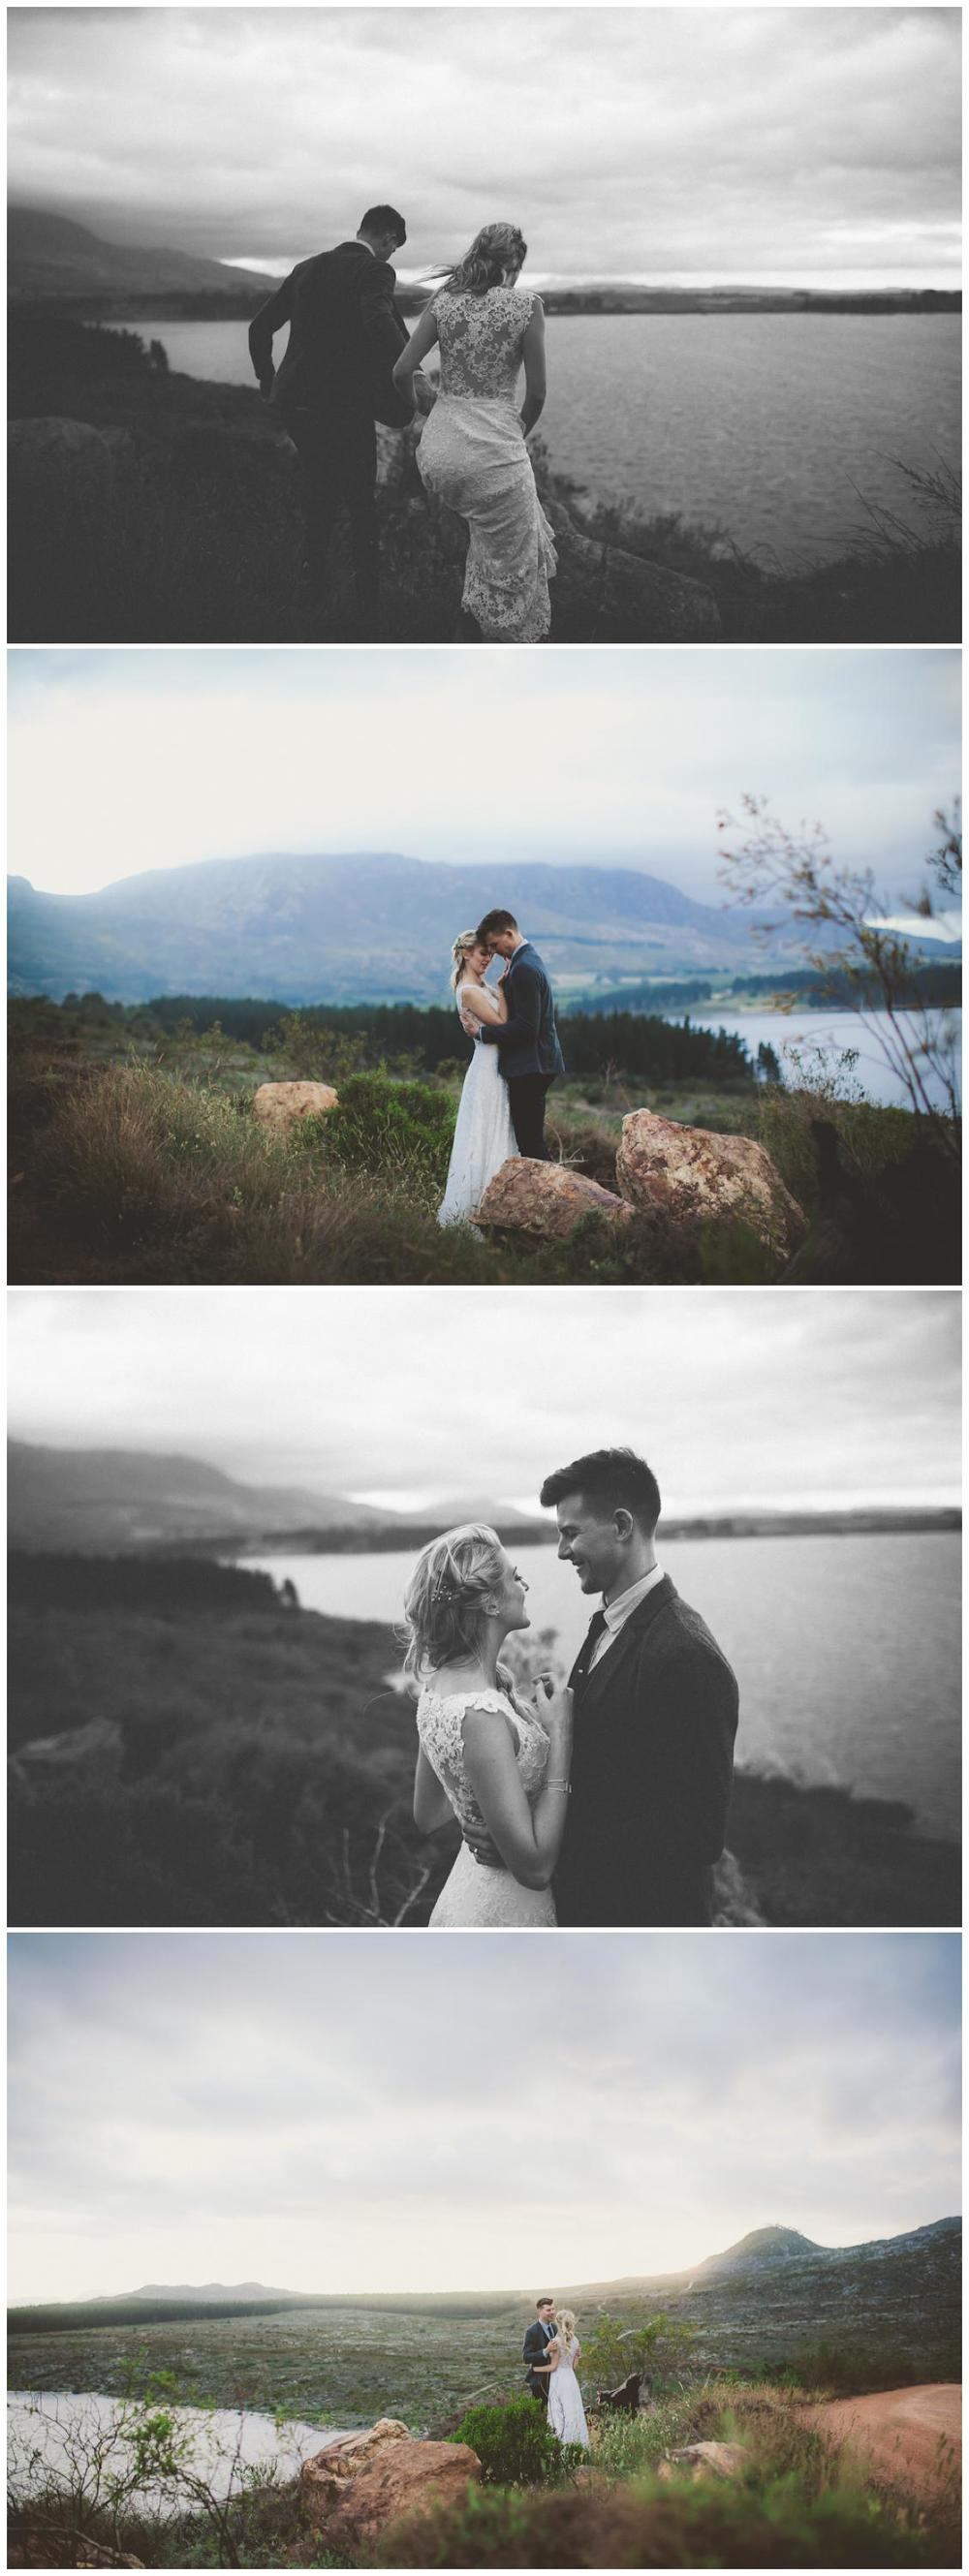 Wessel&Clarissa_FionaClairPhotography-119.jpg